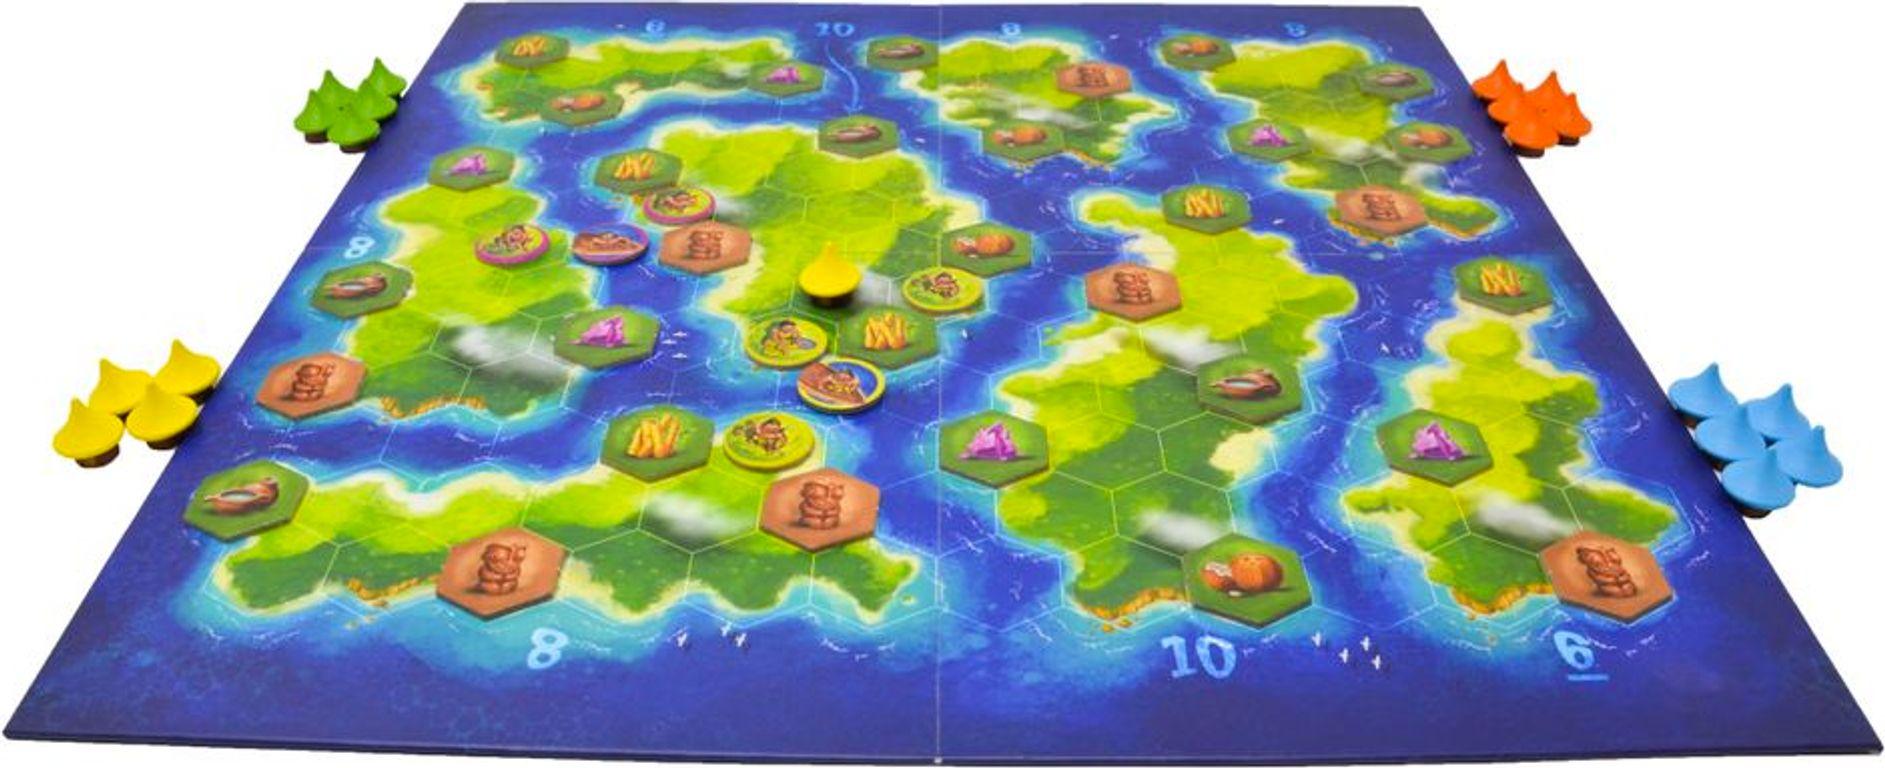 Blue+Lagoon+%5Btrans.gameplay%5D